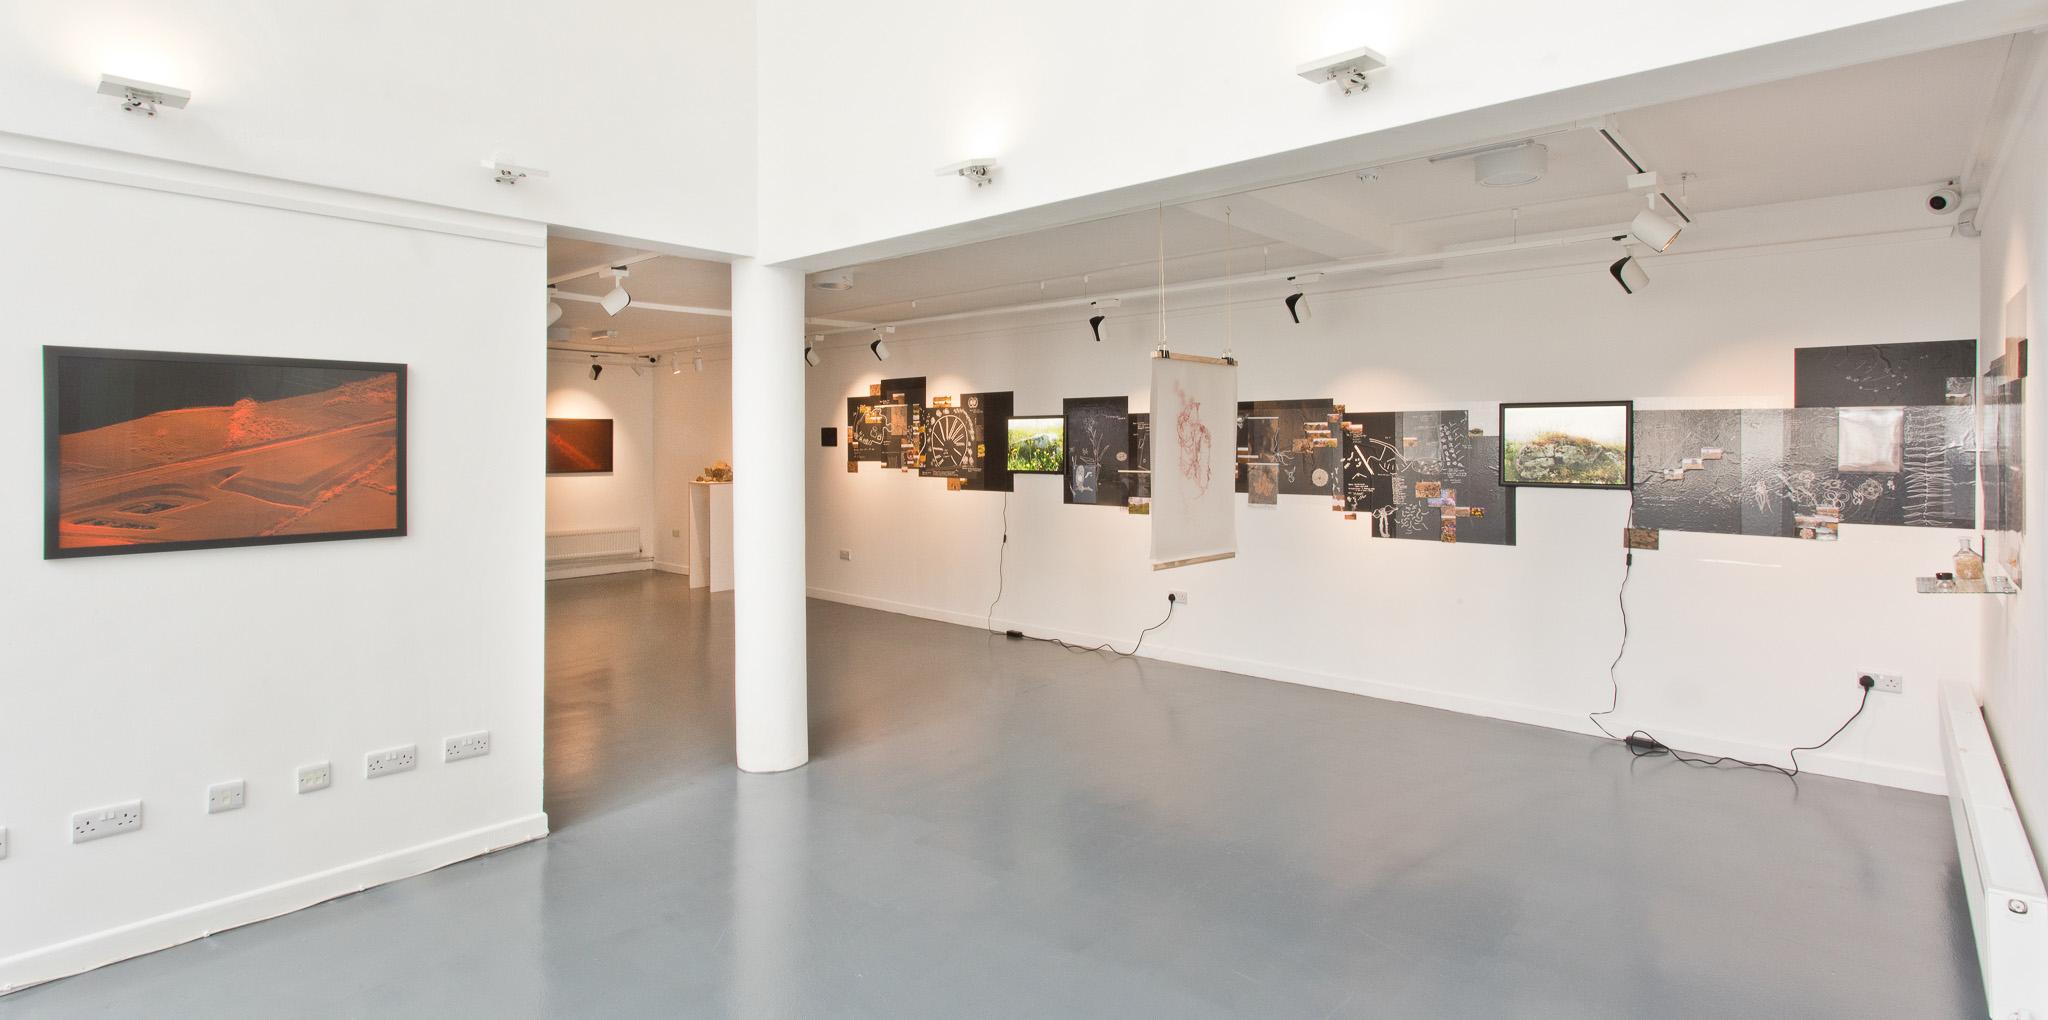 SHUL   Christine Mackey and Martina O'Brien at South Tipperary Arts Centre